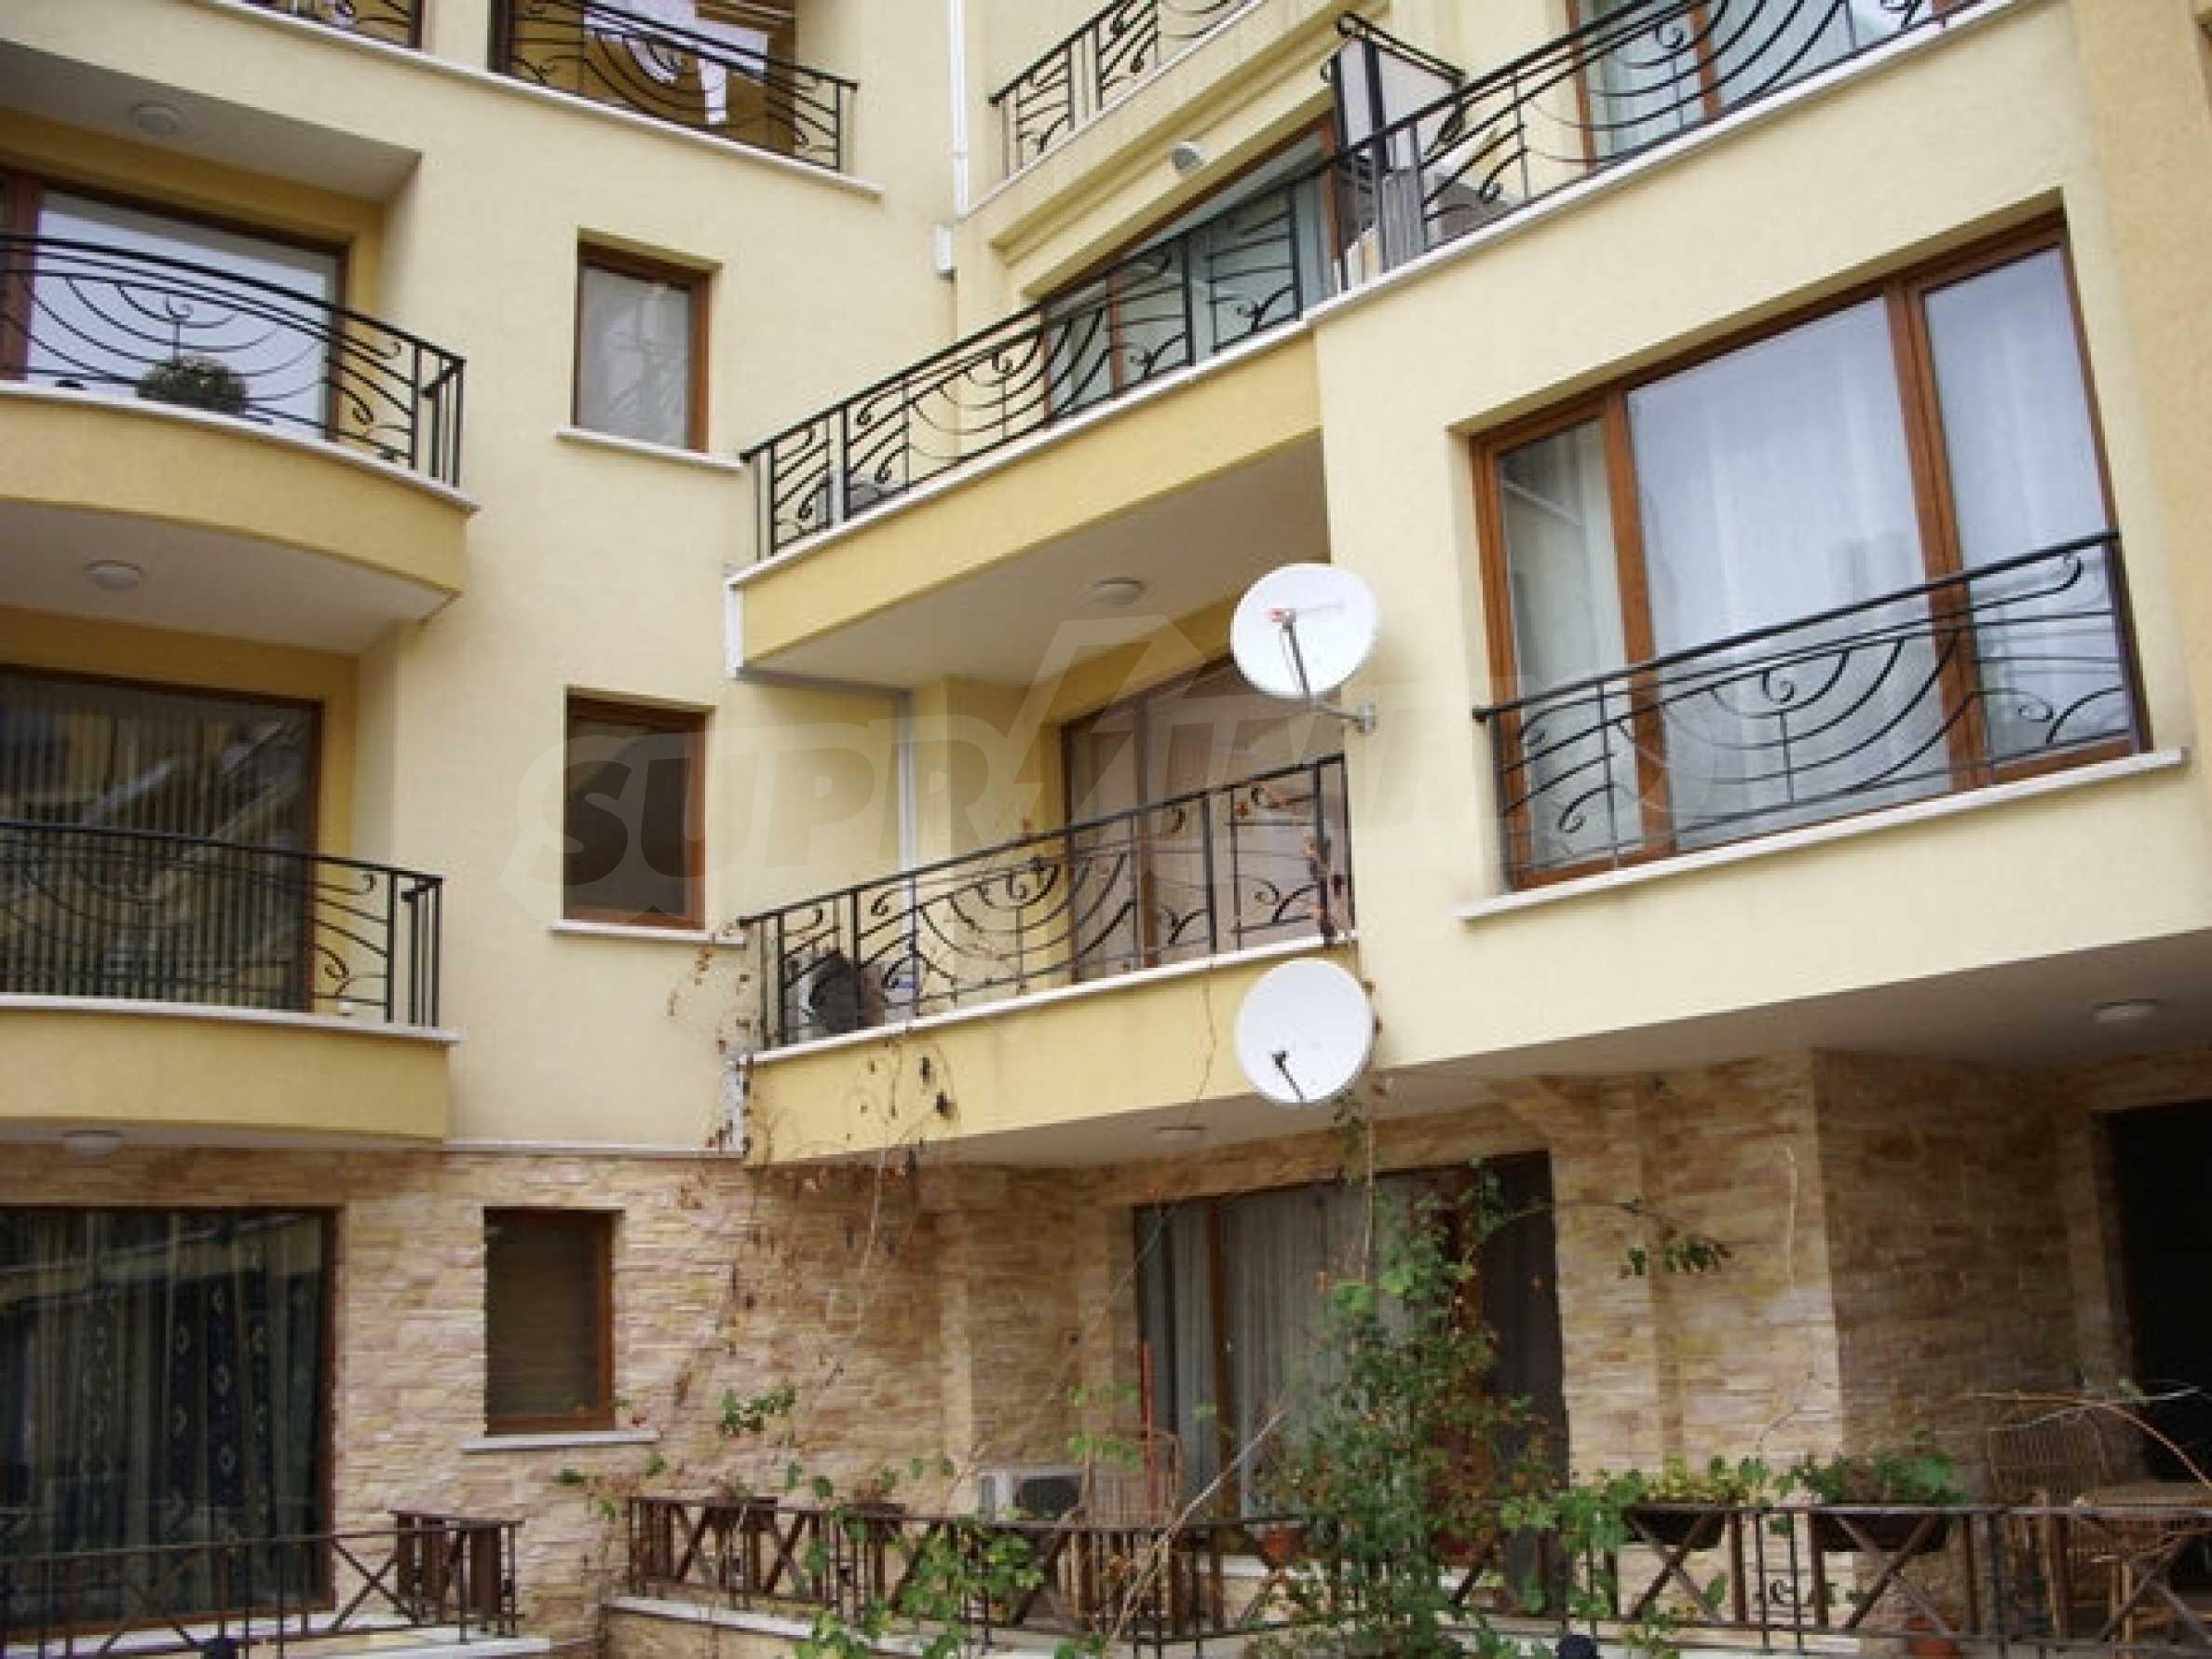 Квартира Евксиноград в Варне 6